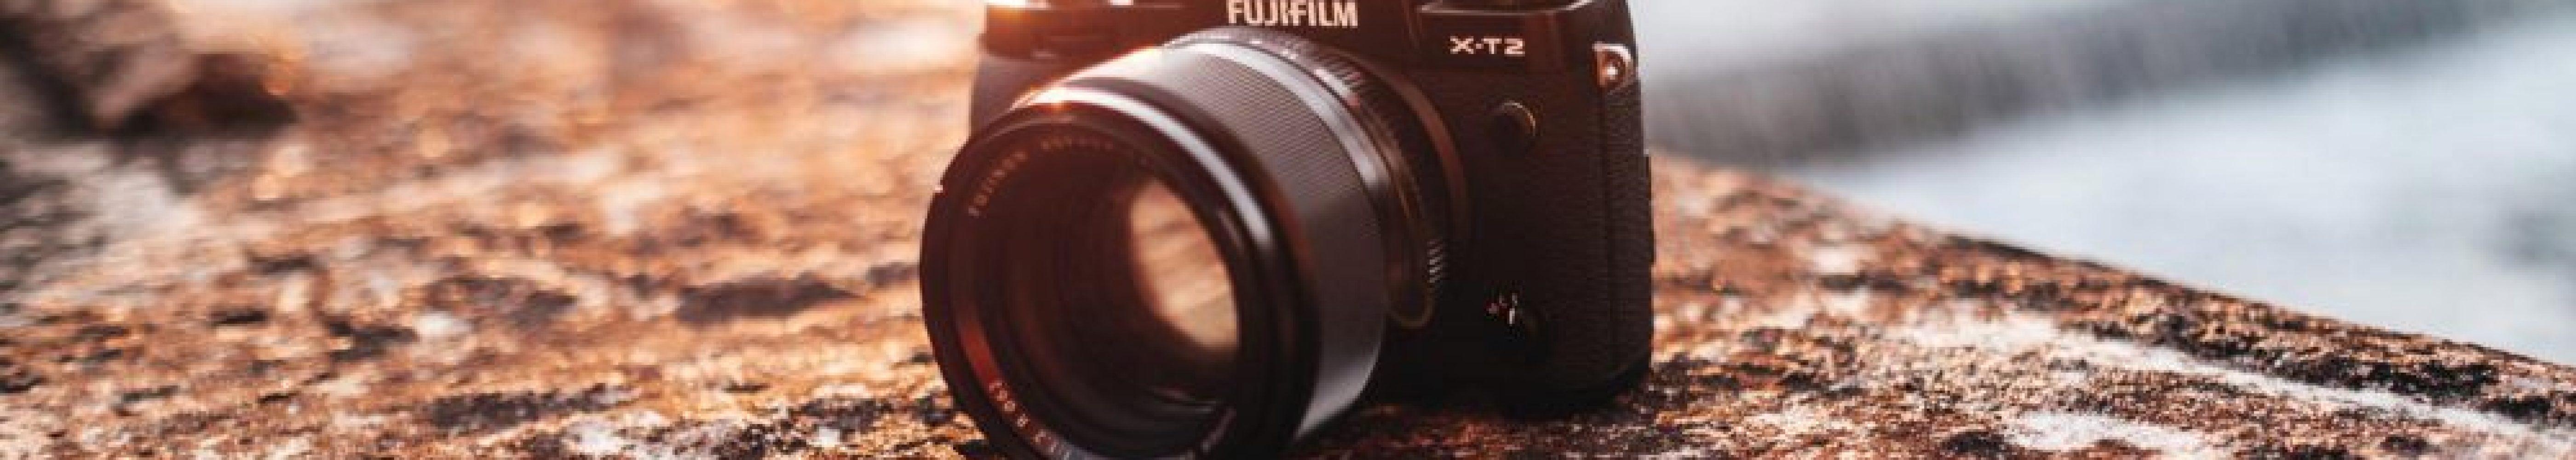 Fujifilm X-T2 in the Real World